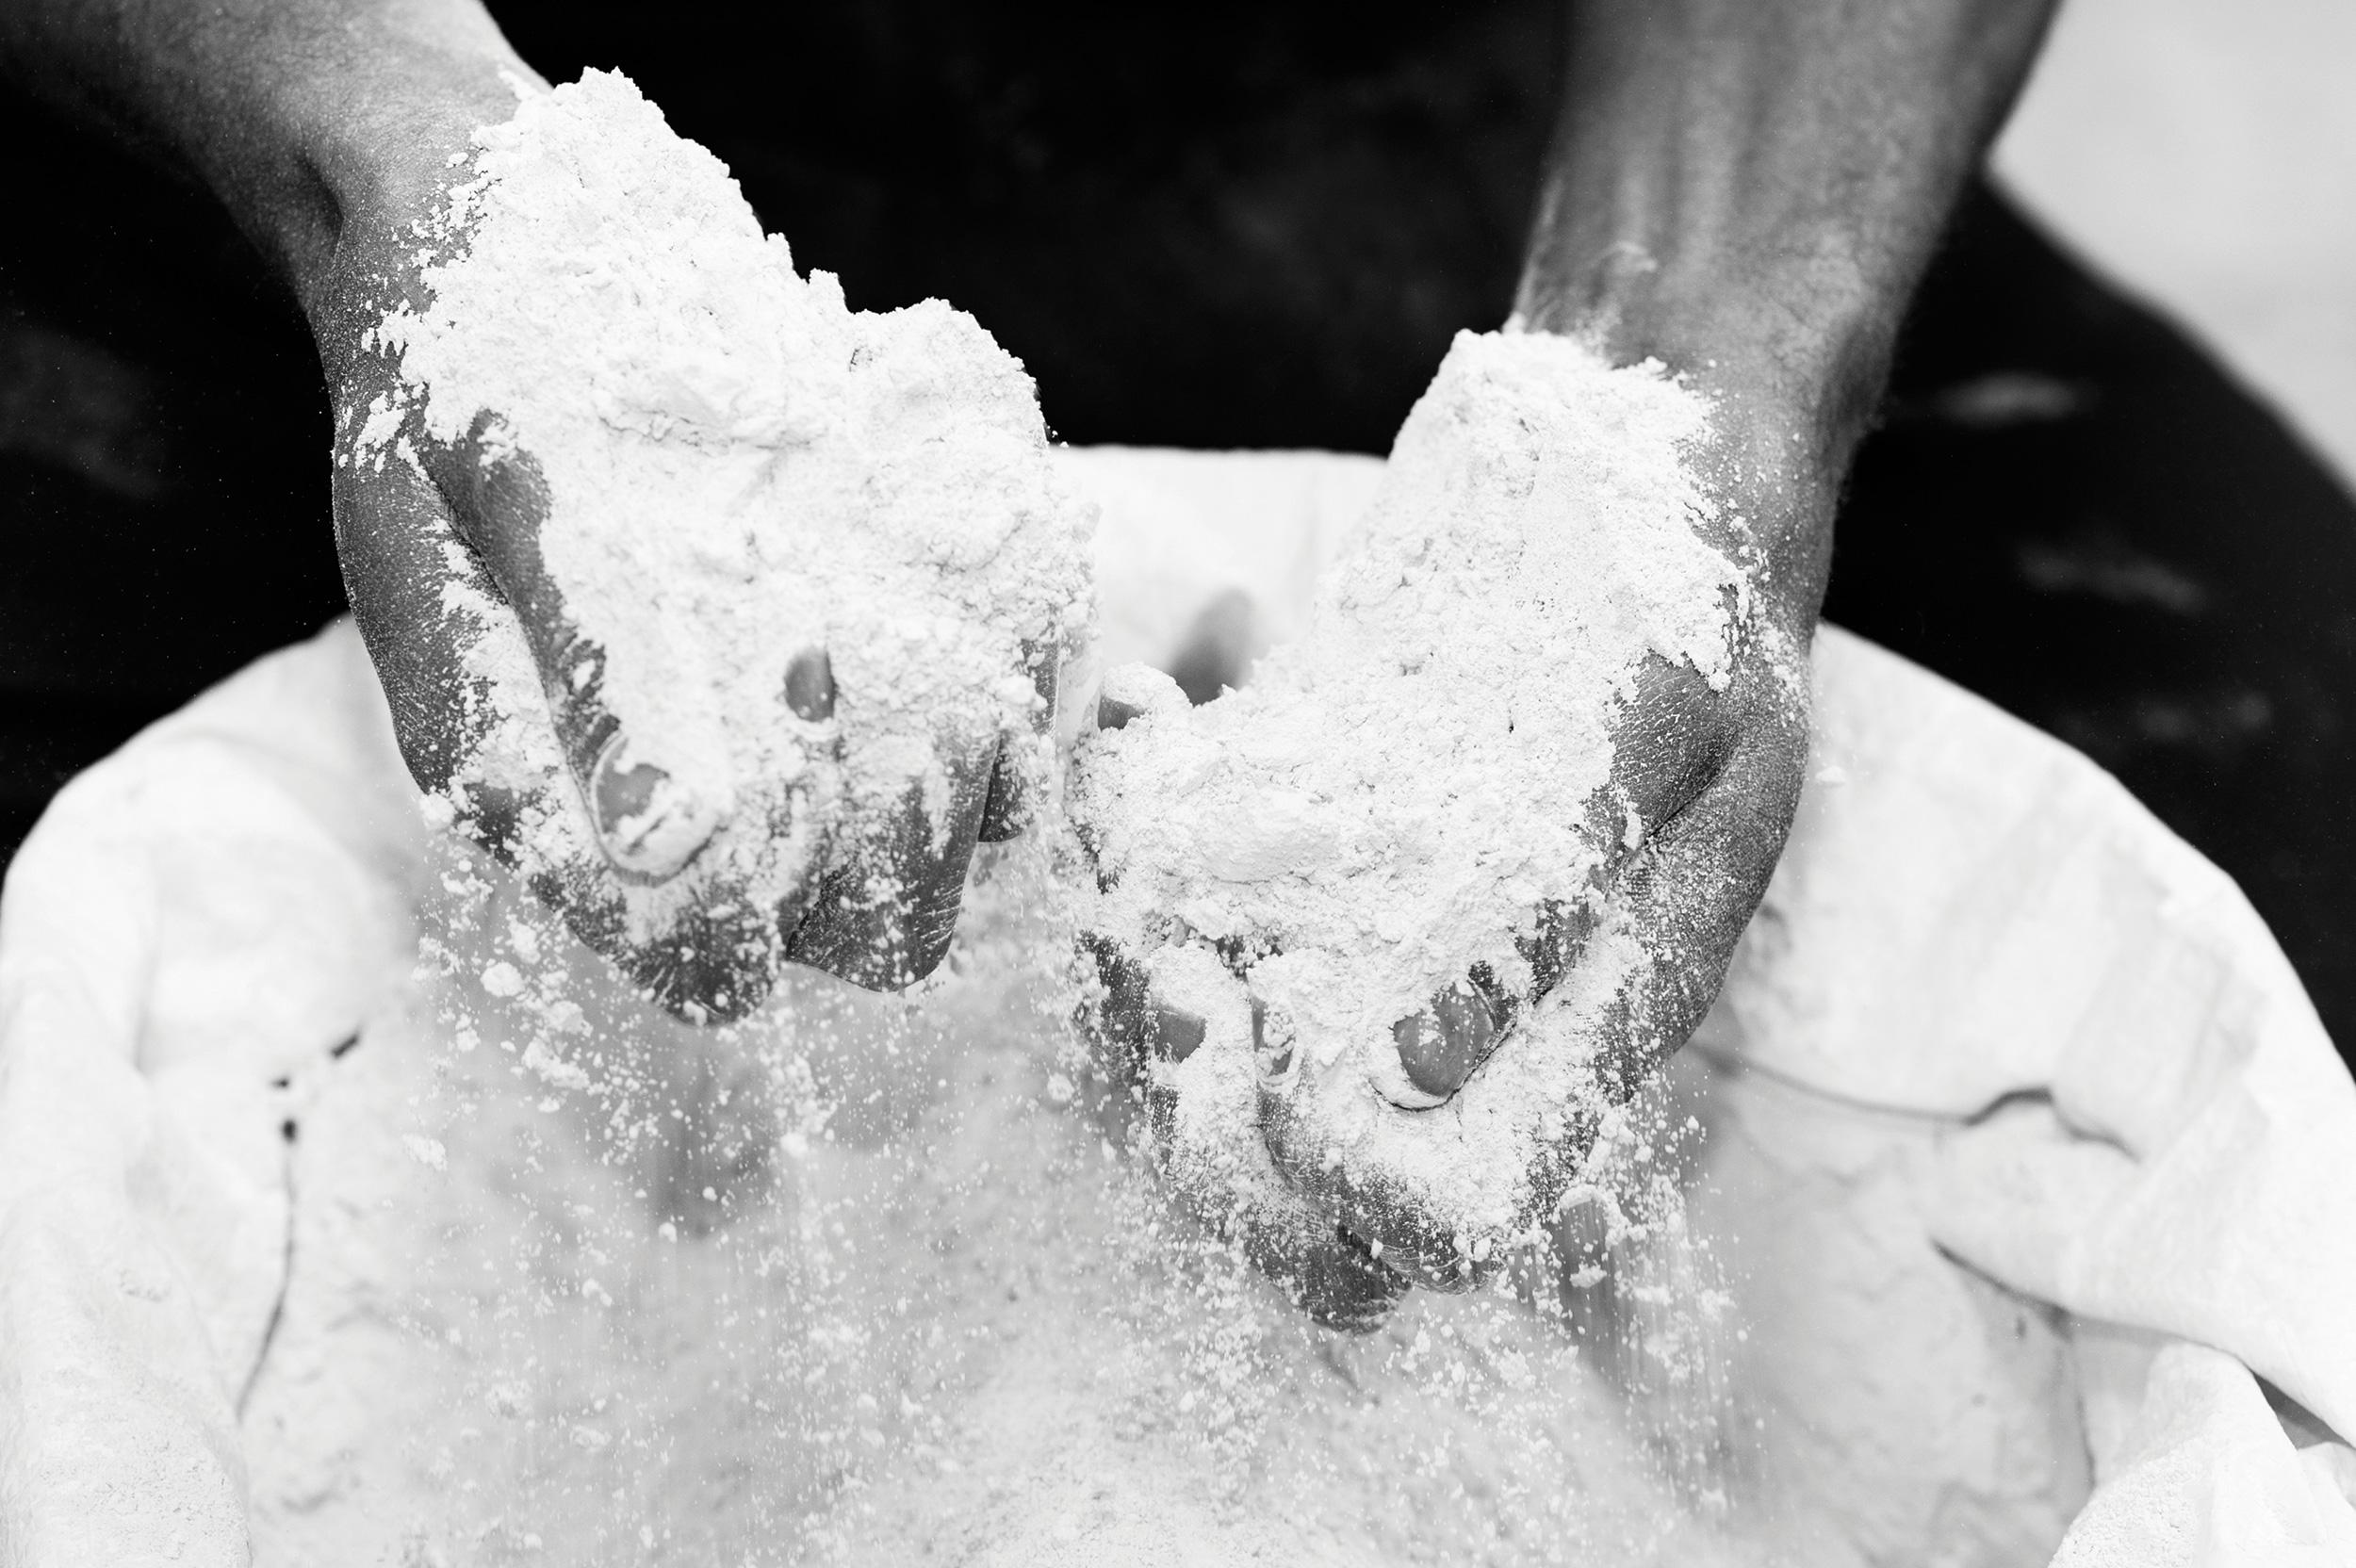 kapula-handmade-ceramics-factory-process-hands.jpg